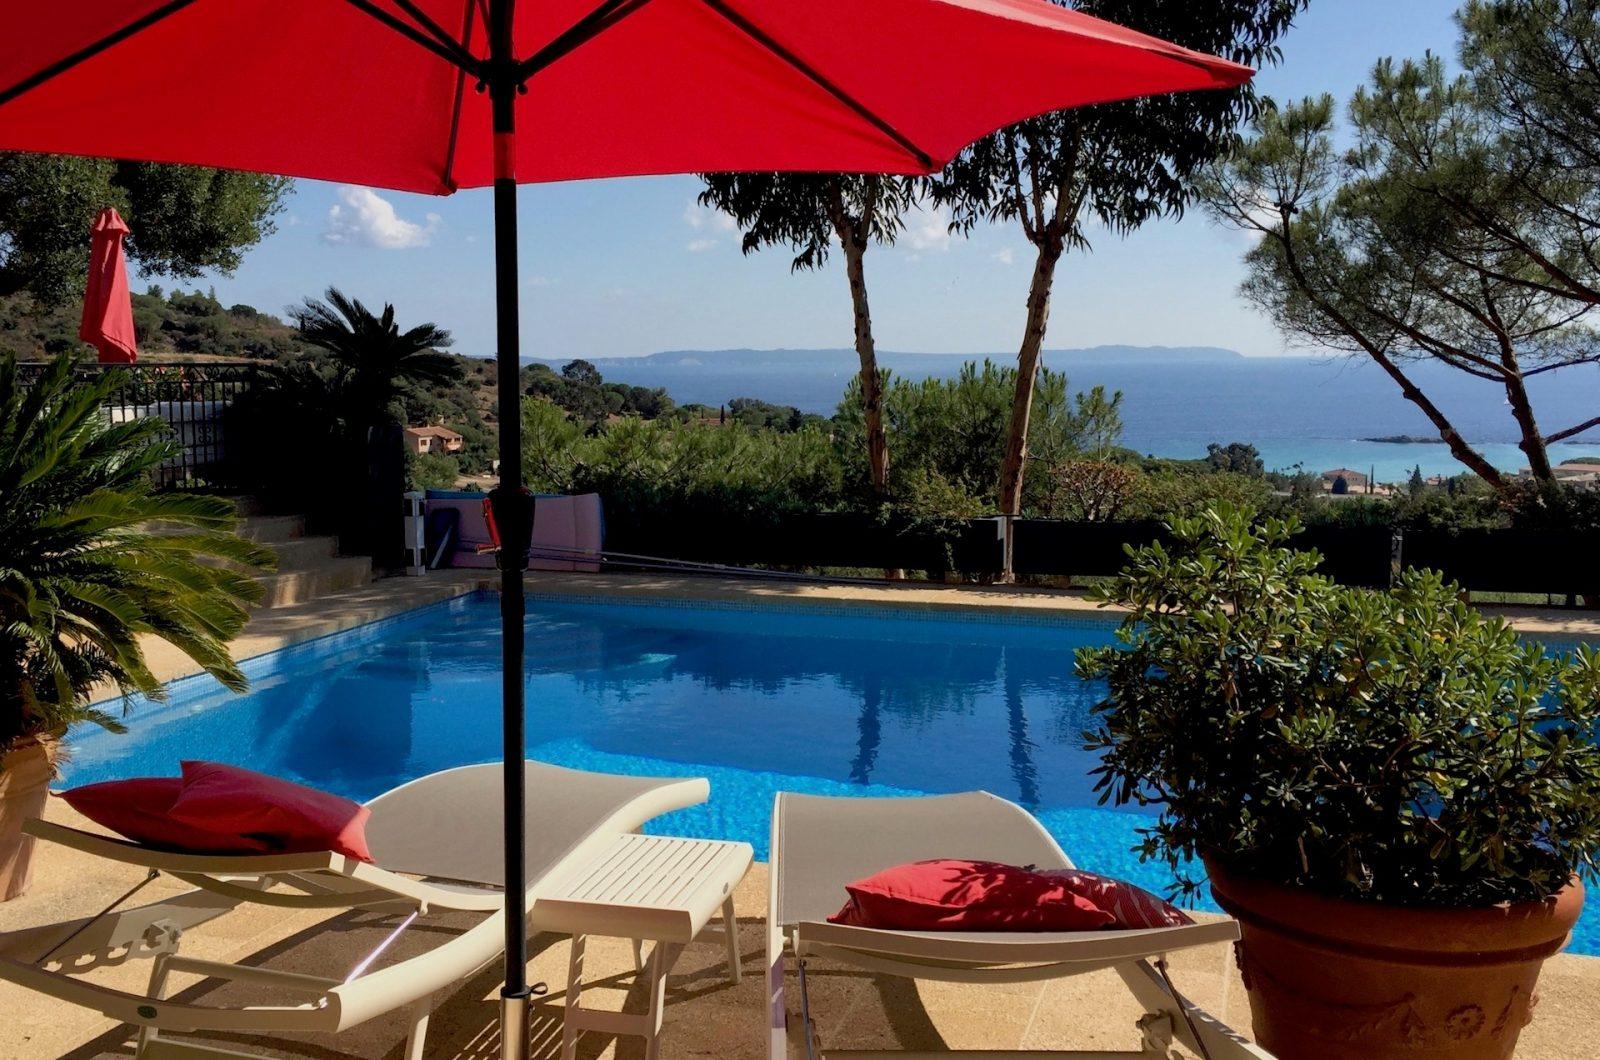 Piscine Villa Thalassa chambre d'hôte